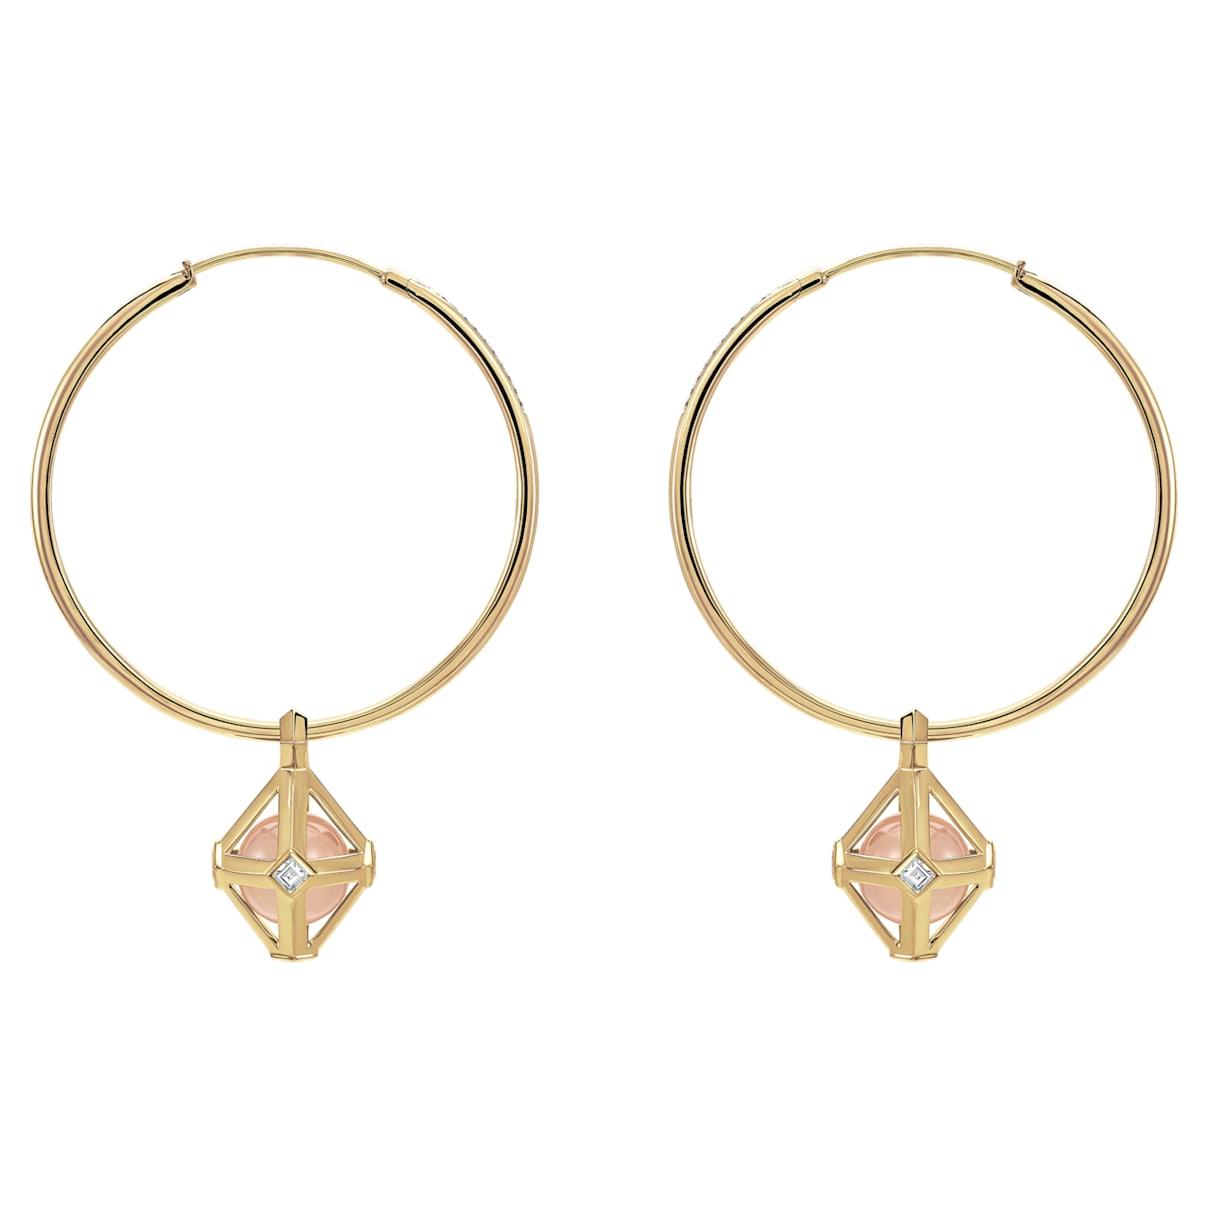 Double Diamond Drop Earrings, Genuine Rose Quartz & Swarovski Created Diamonds, 14K Yellow Gold